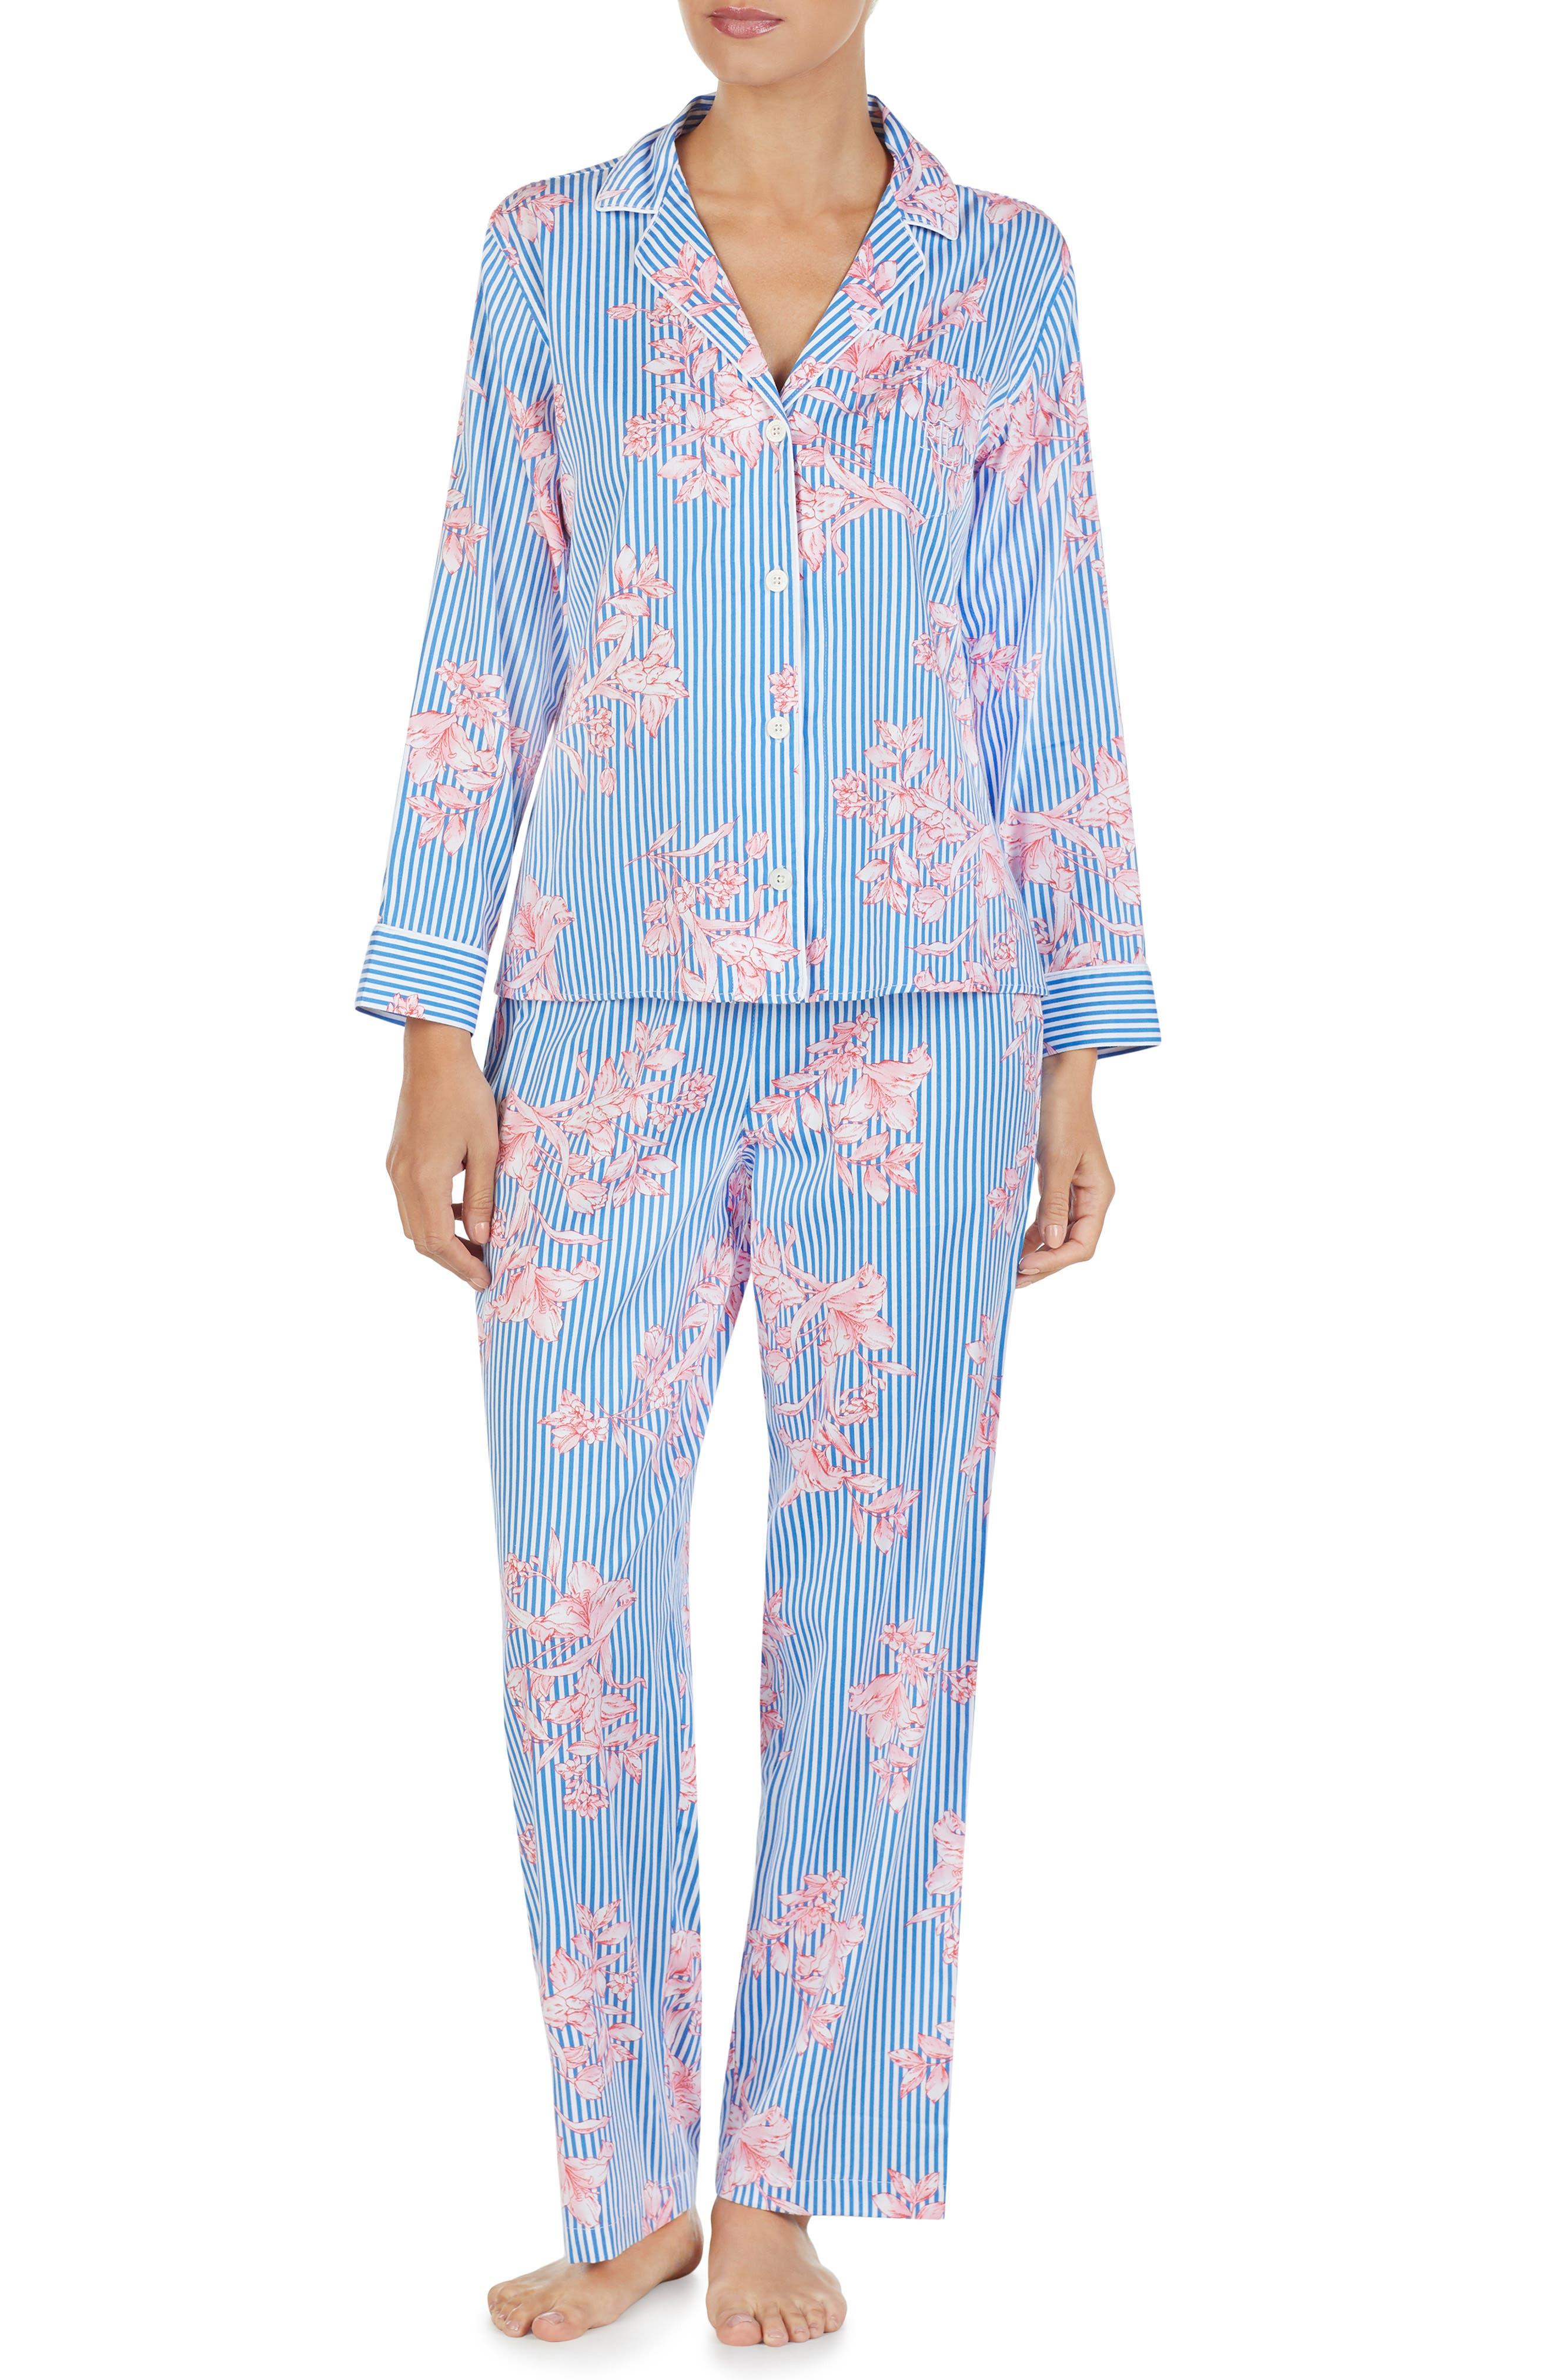 LAUREN RALPH LAUREN, Floral Pajamas, Main thumbnail 1, color, 486